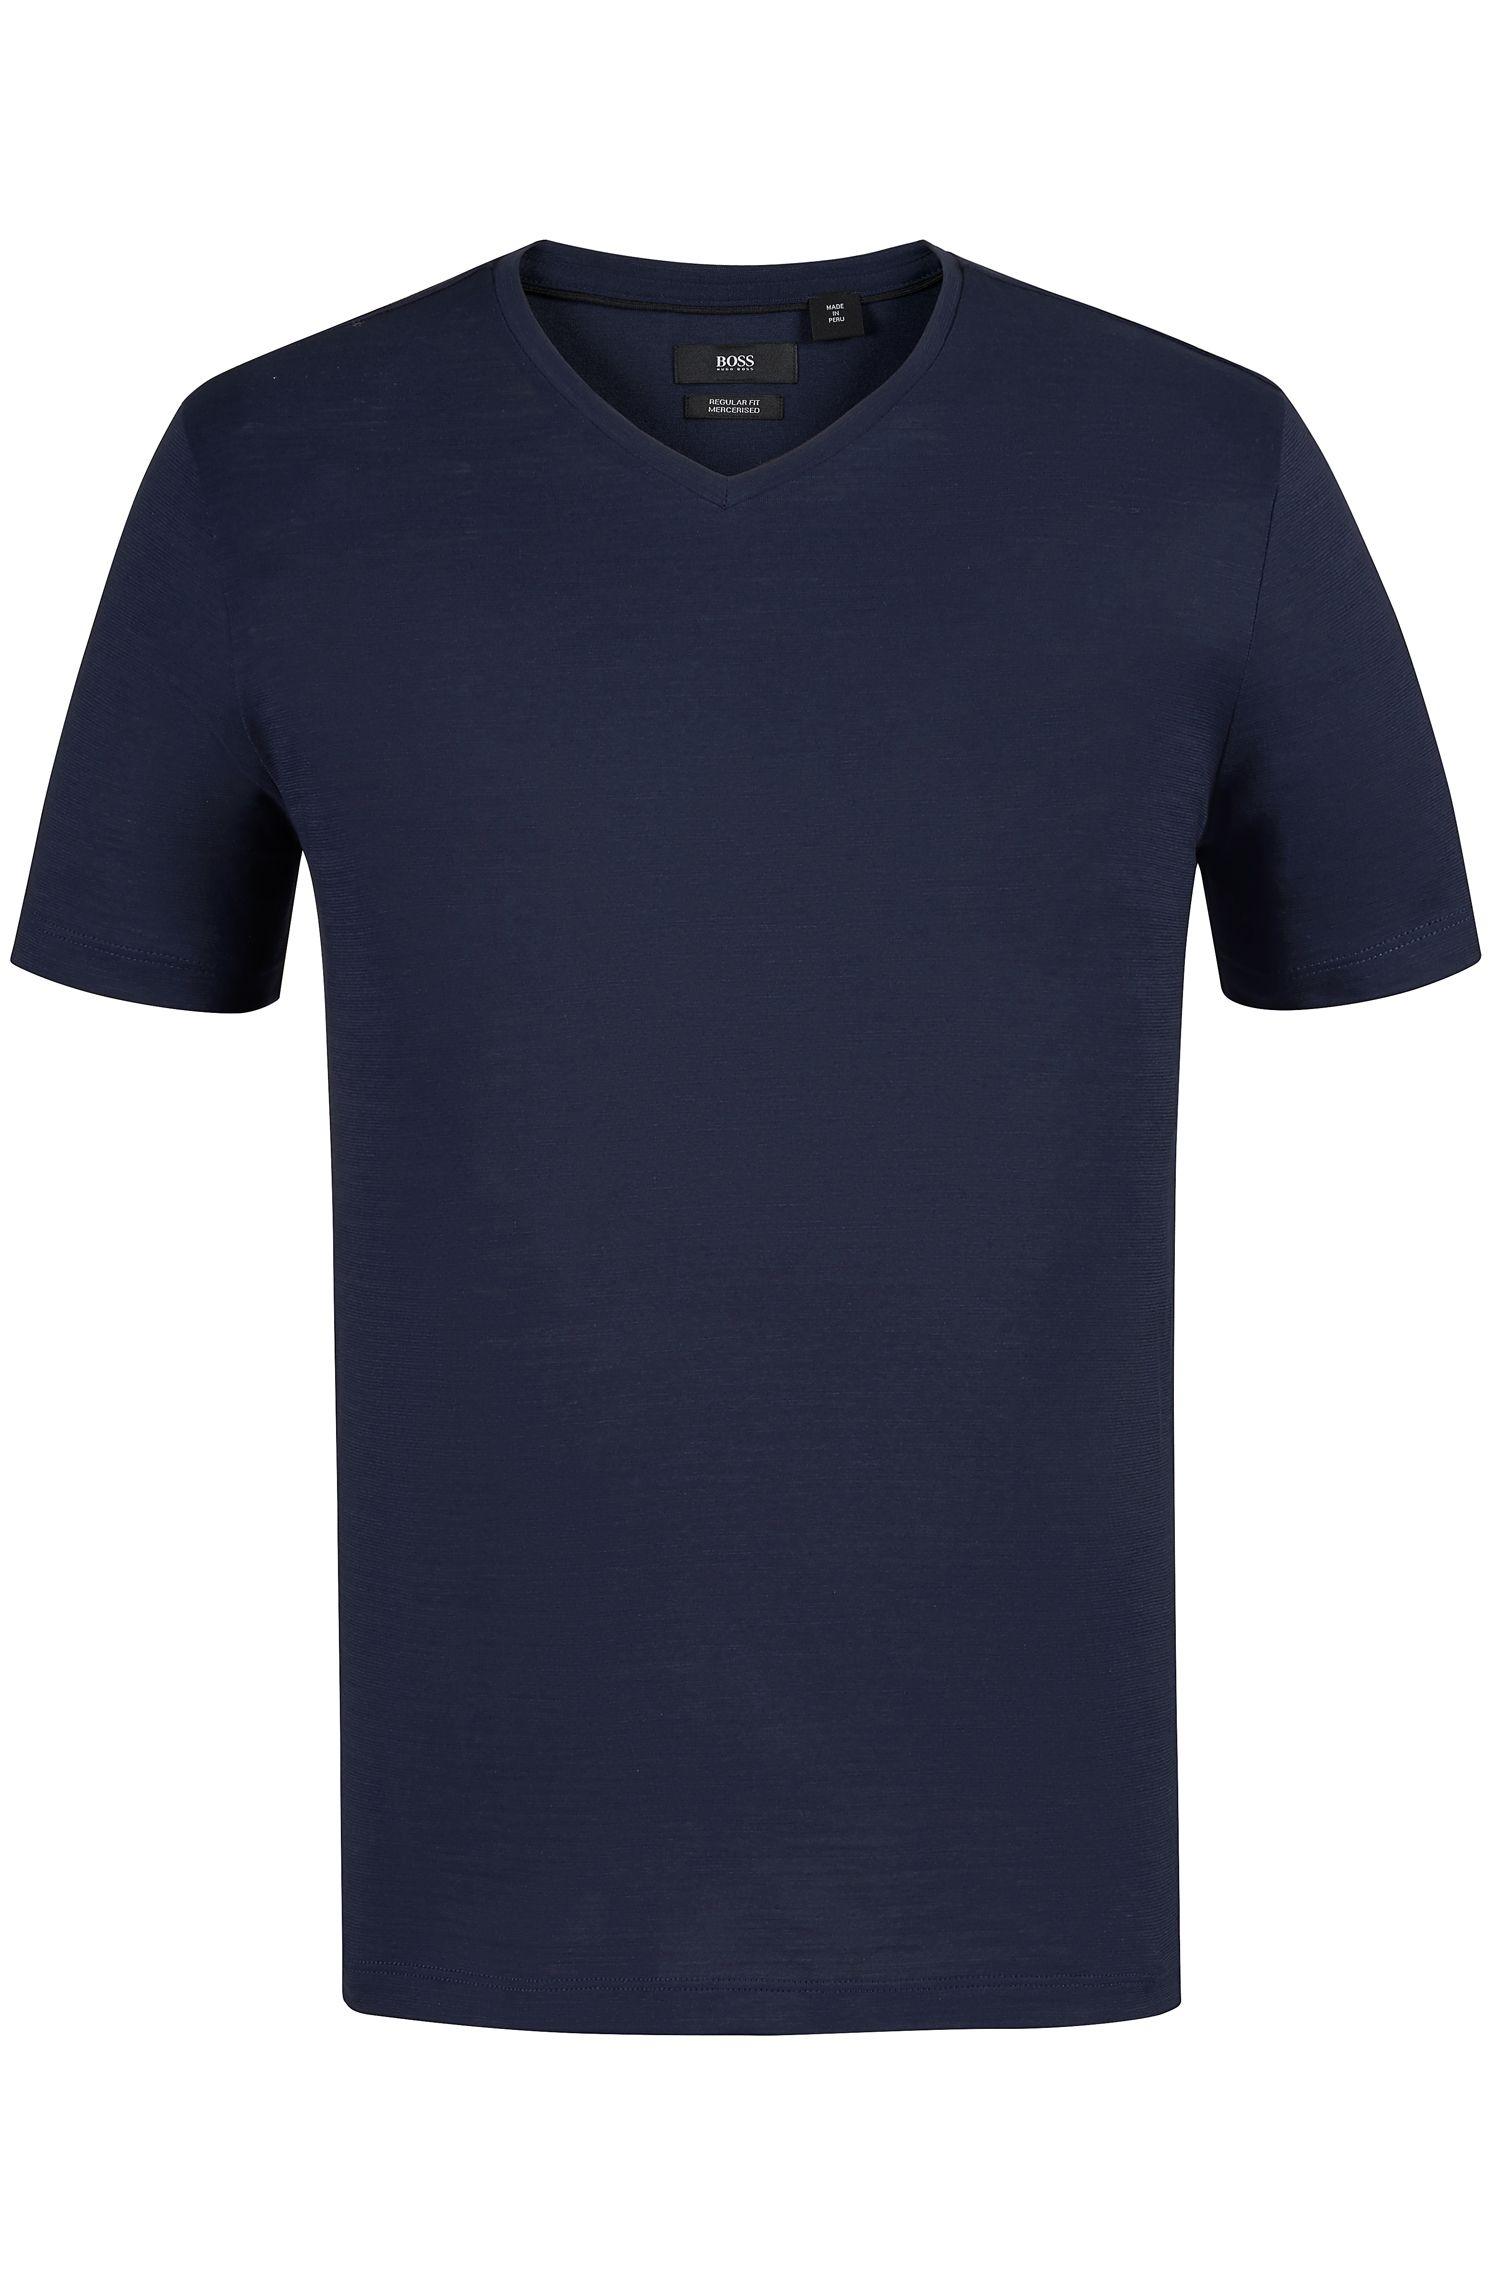 Mercerized Cotton T-Shirt | Tilson